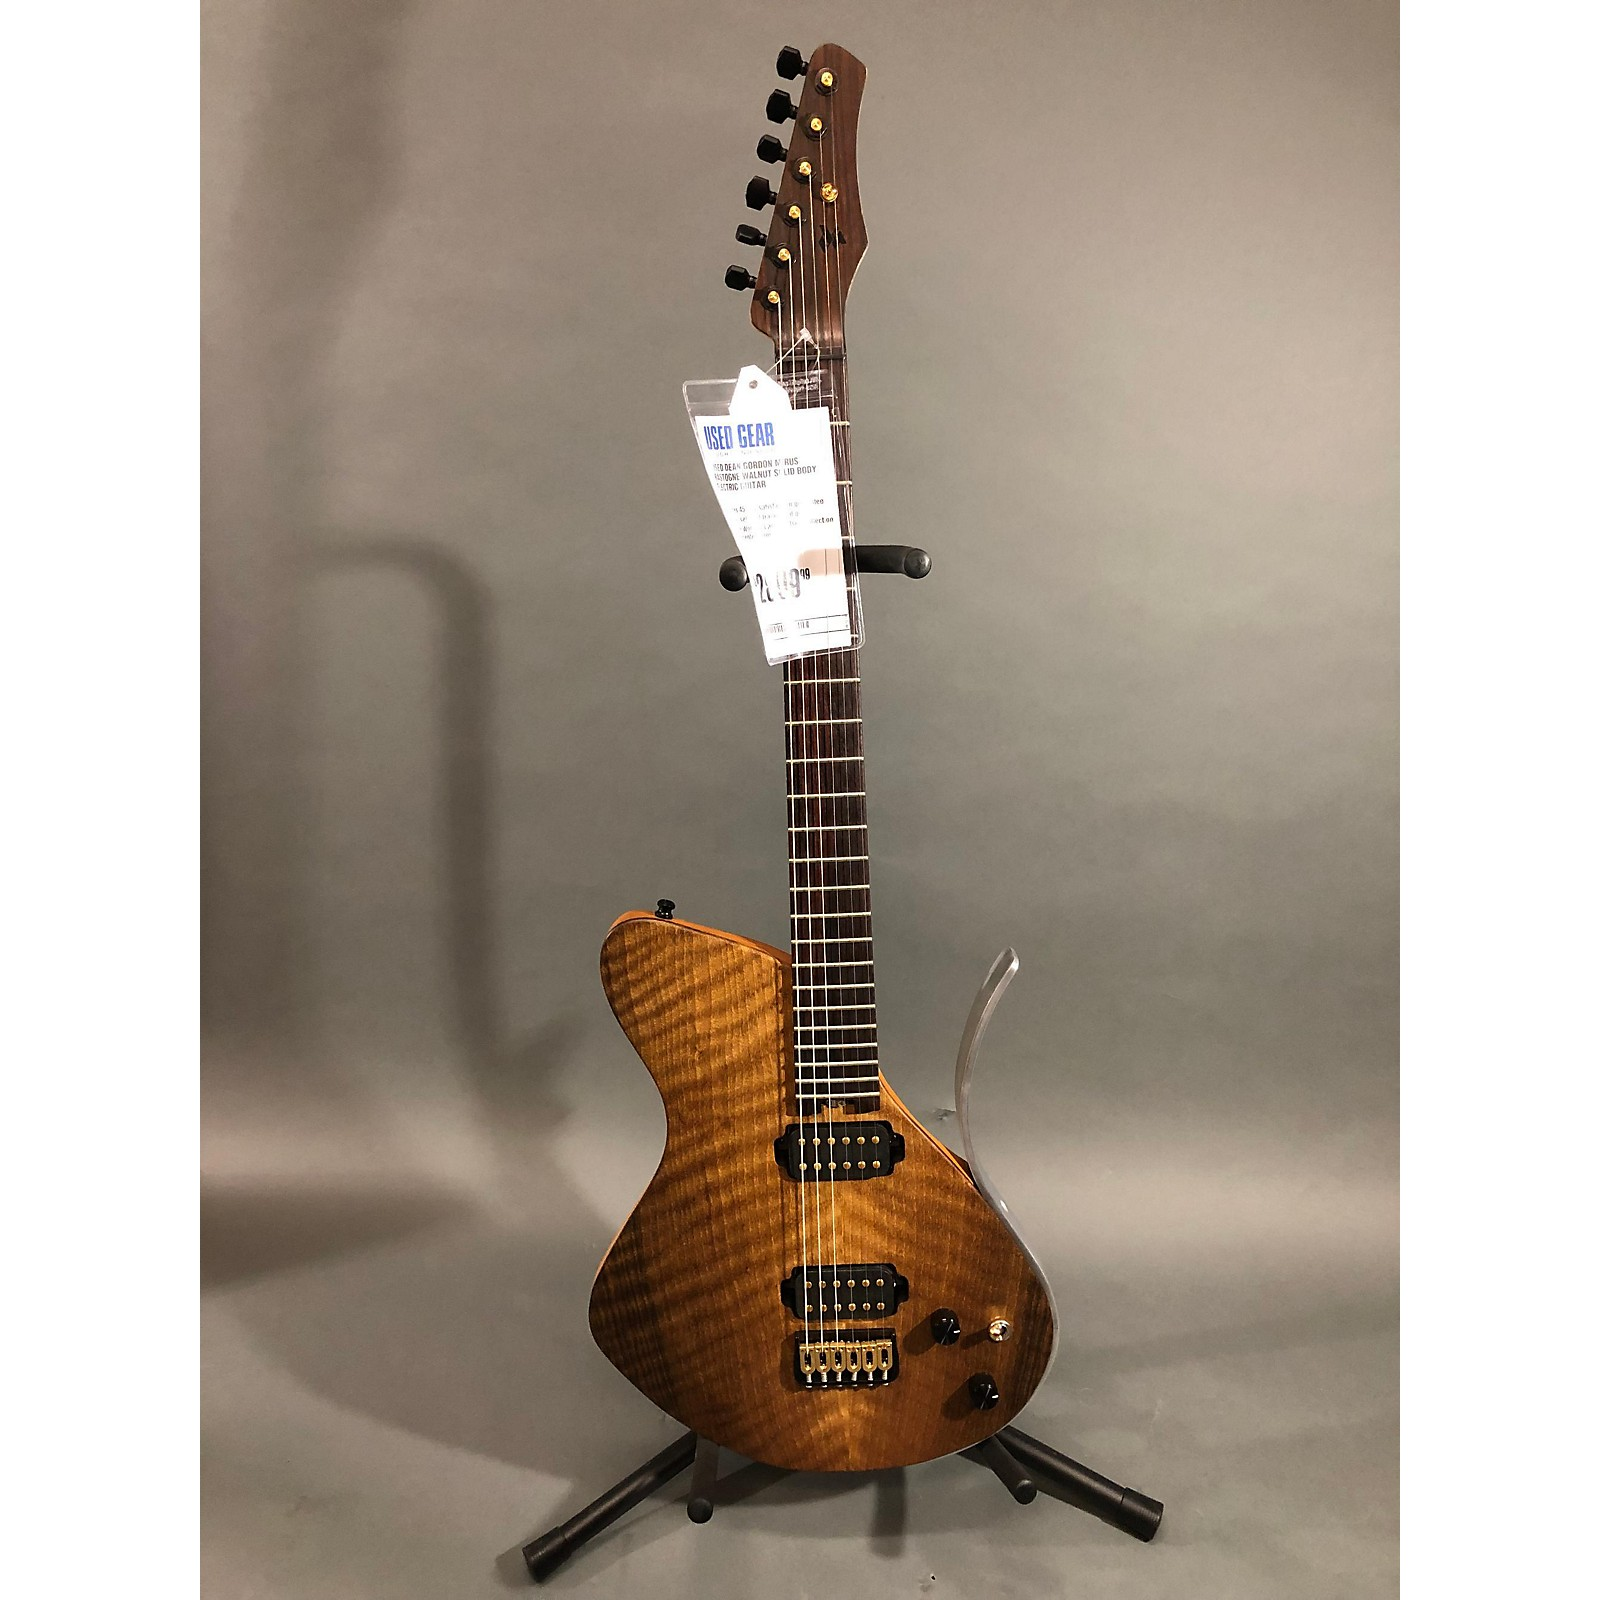 In Store Used Used DEAN GORDON MIRUS BASTOGNE WALNUT Solid Body Electric Guitar